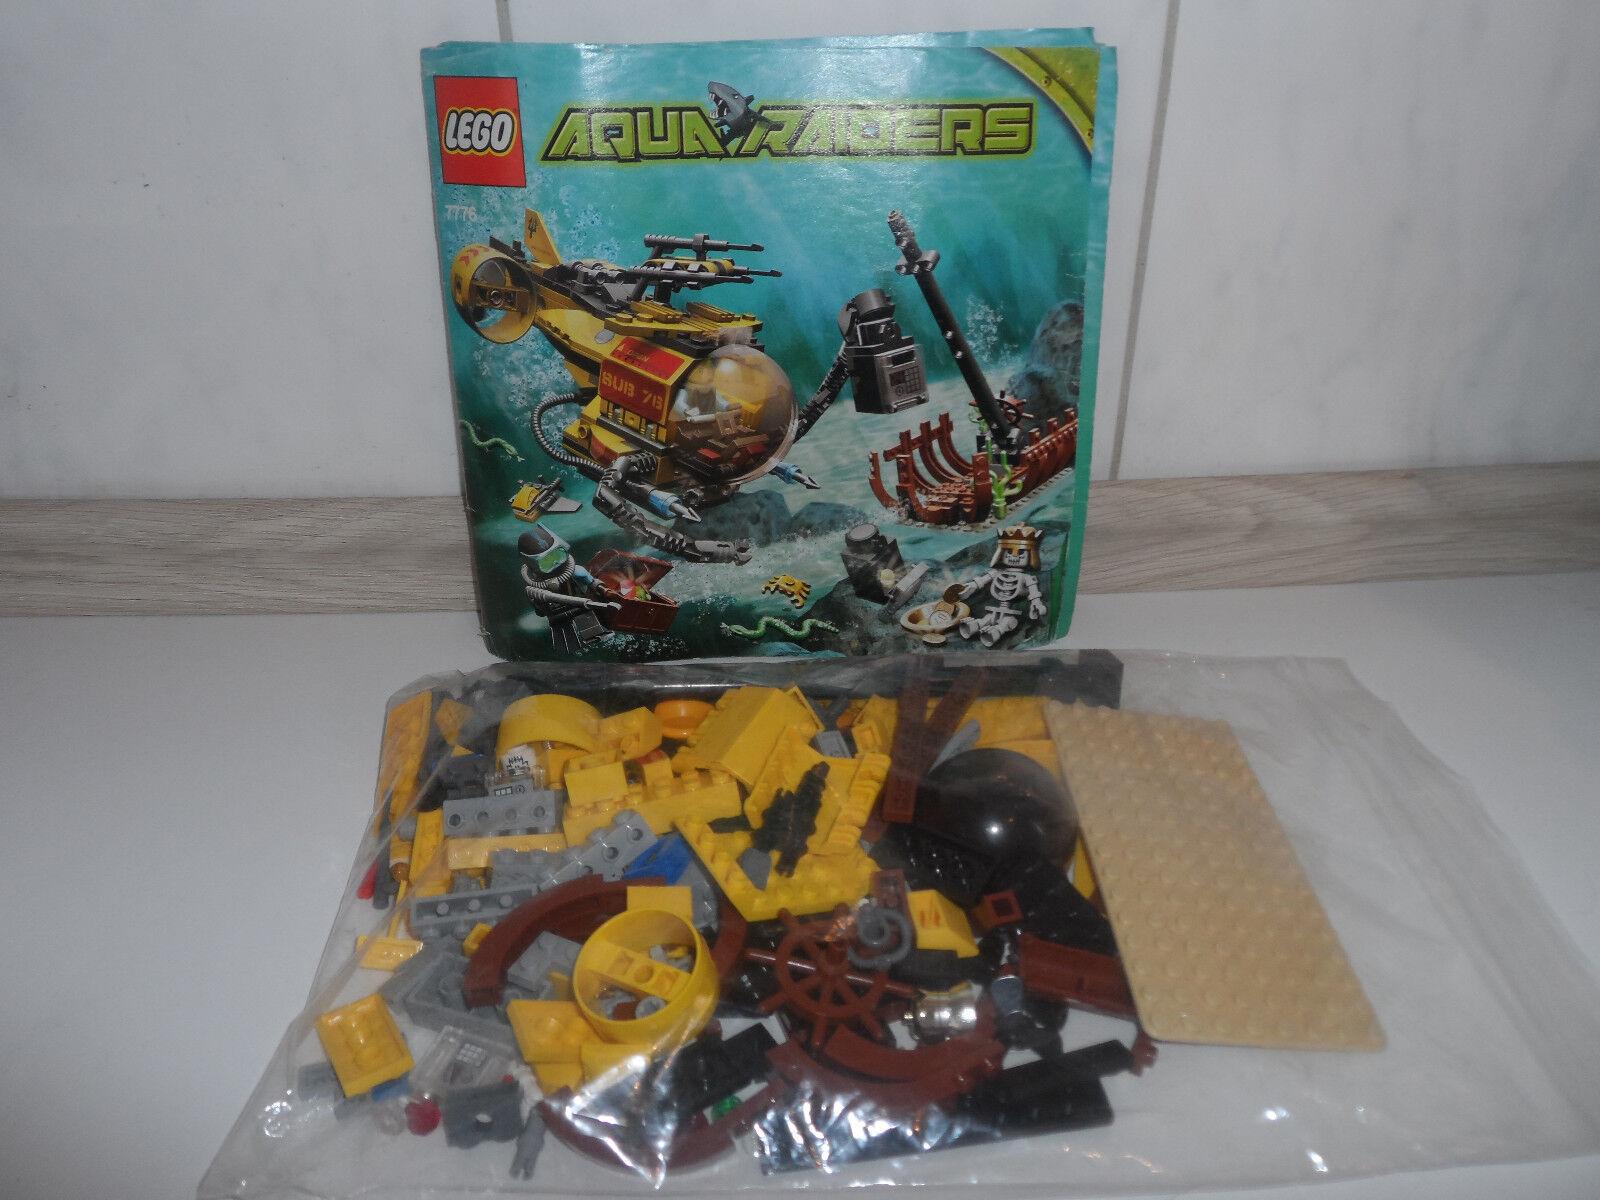 LEGO set 7776 Aqua Raiders bateau épave